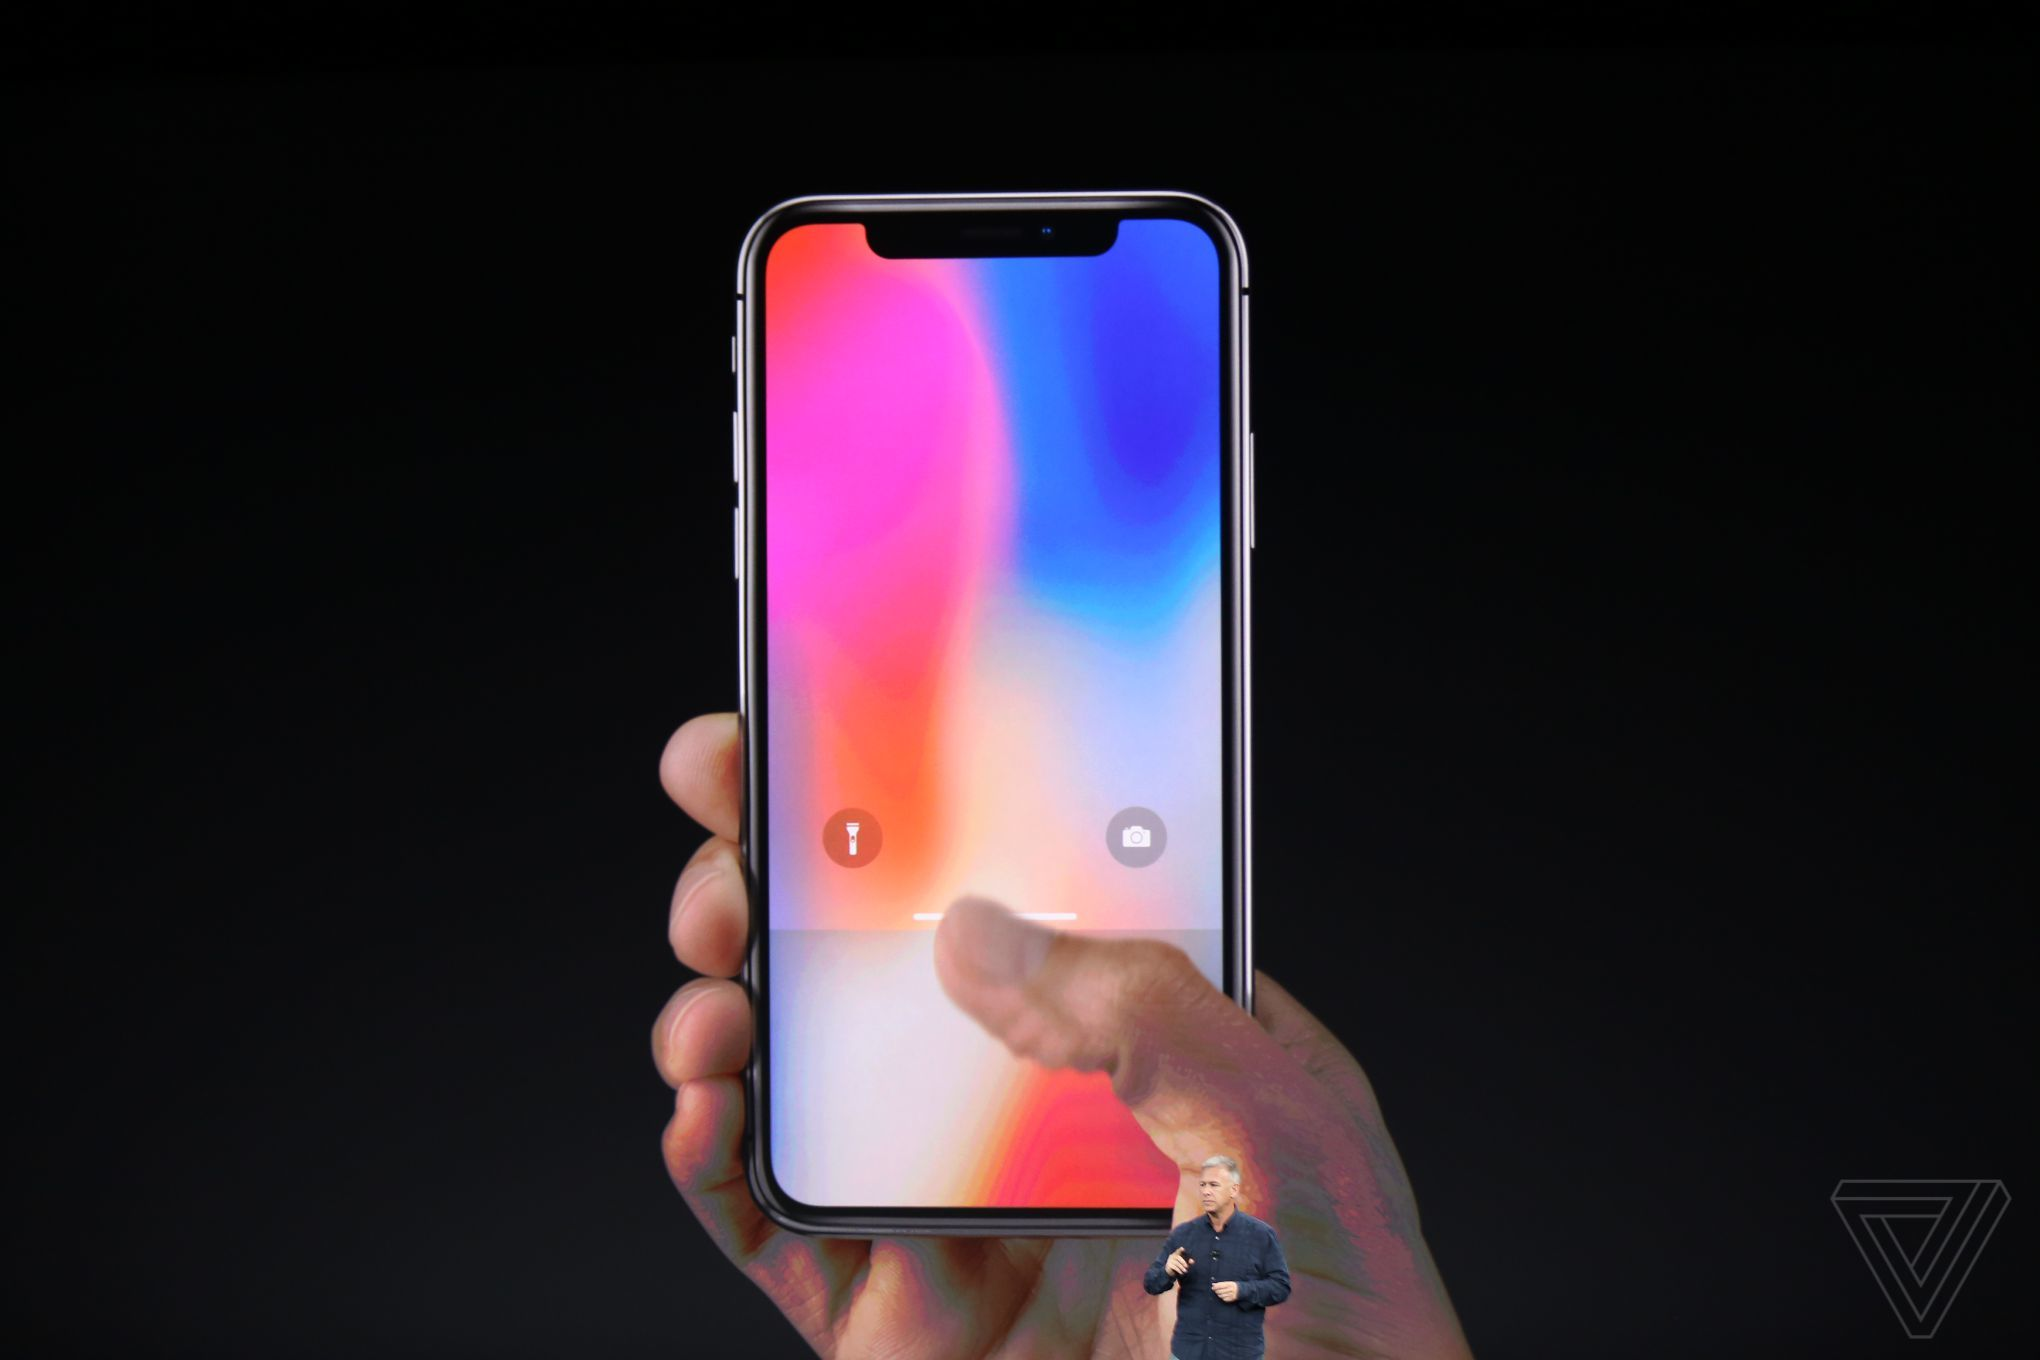 Ни рамок, ни слабостей — Apple показала iPhone X